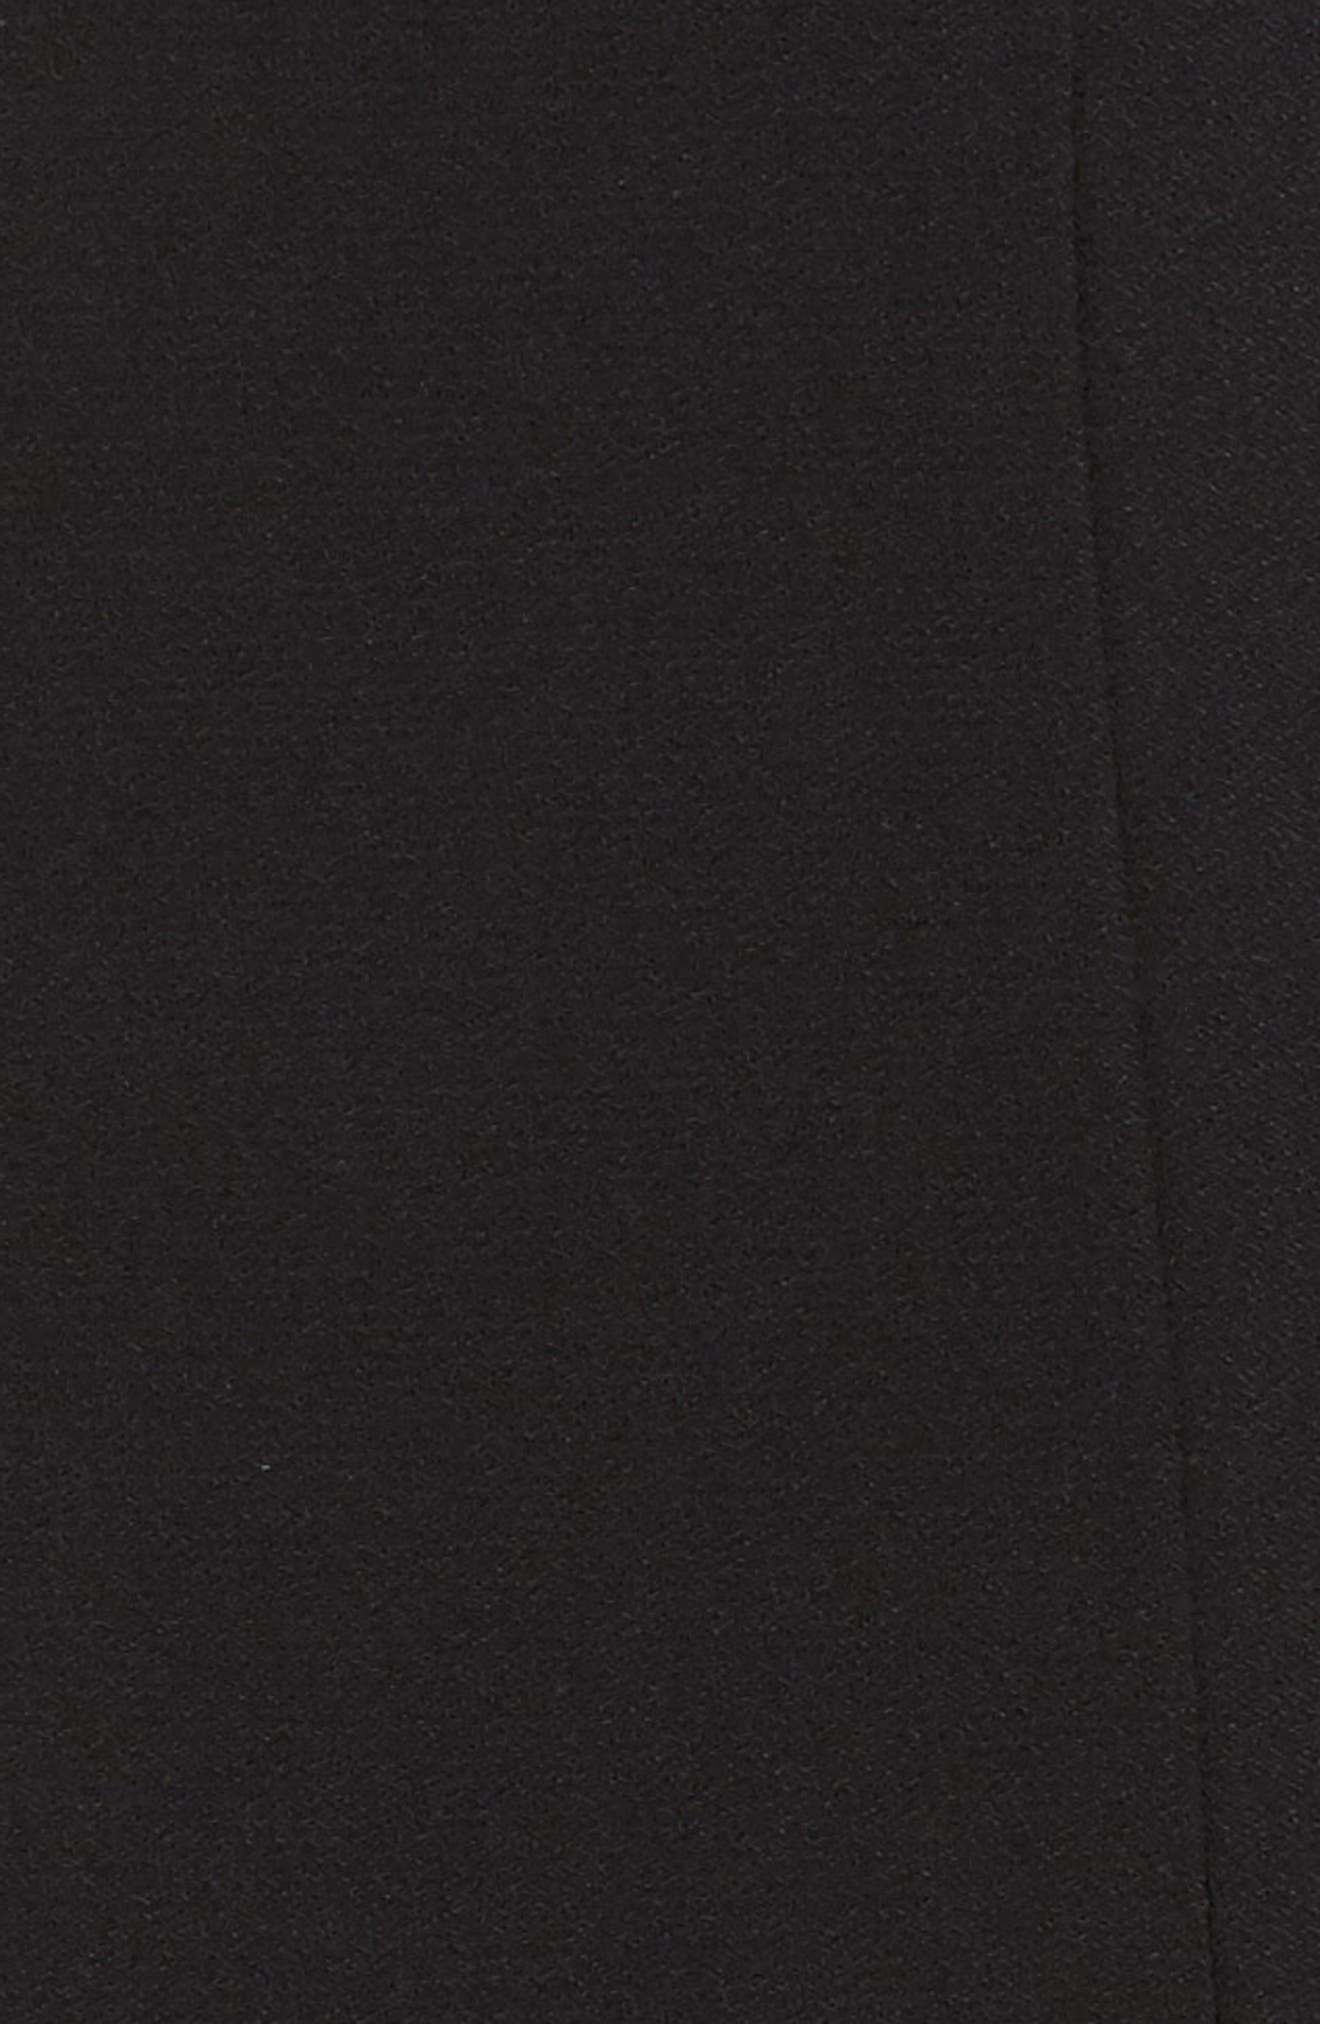 Off the Shoulder Sheath Dress,                             Alternate thumbnail 5, color,                             001